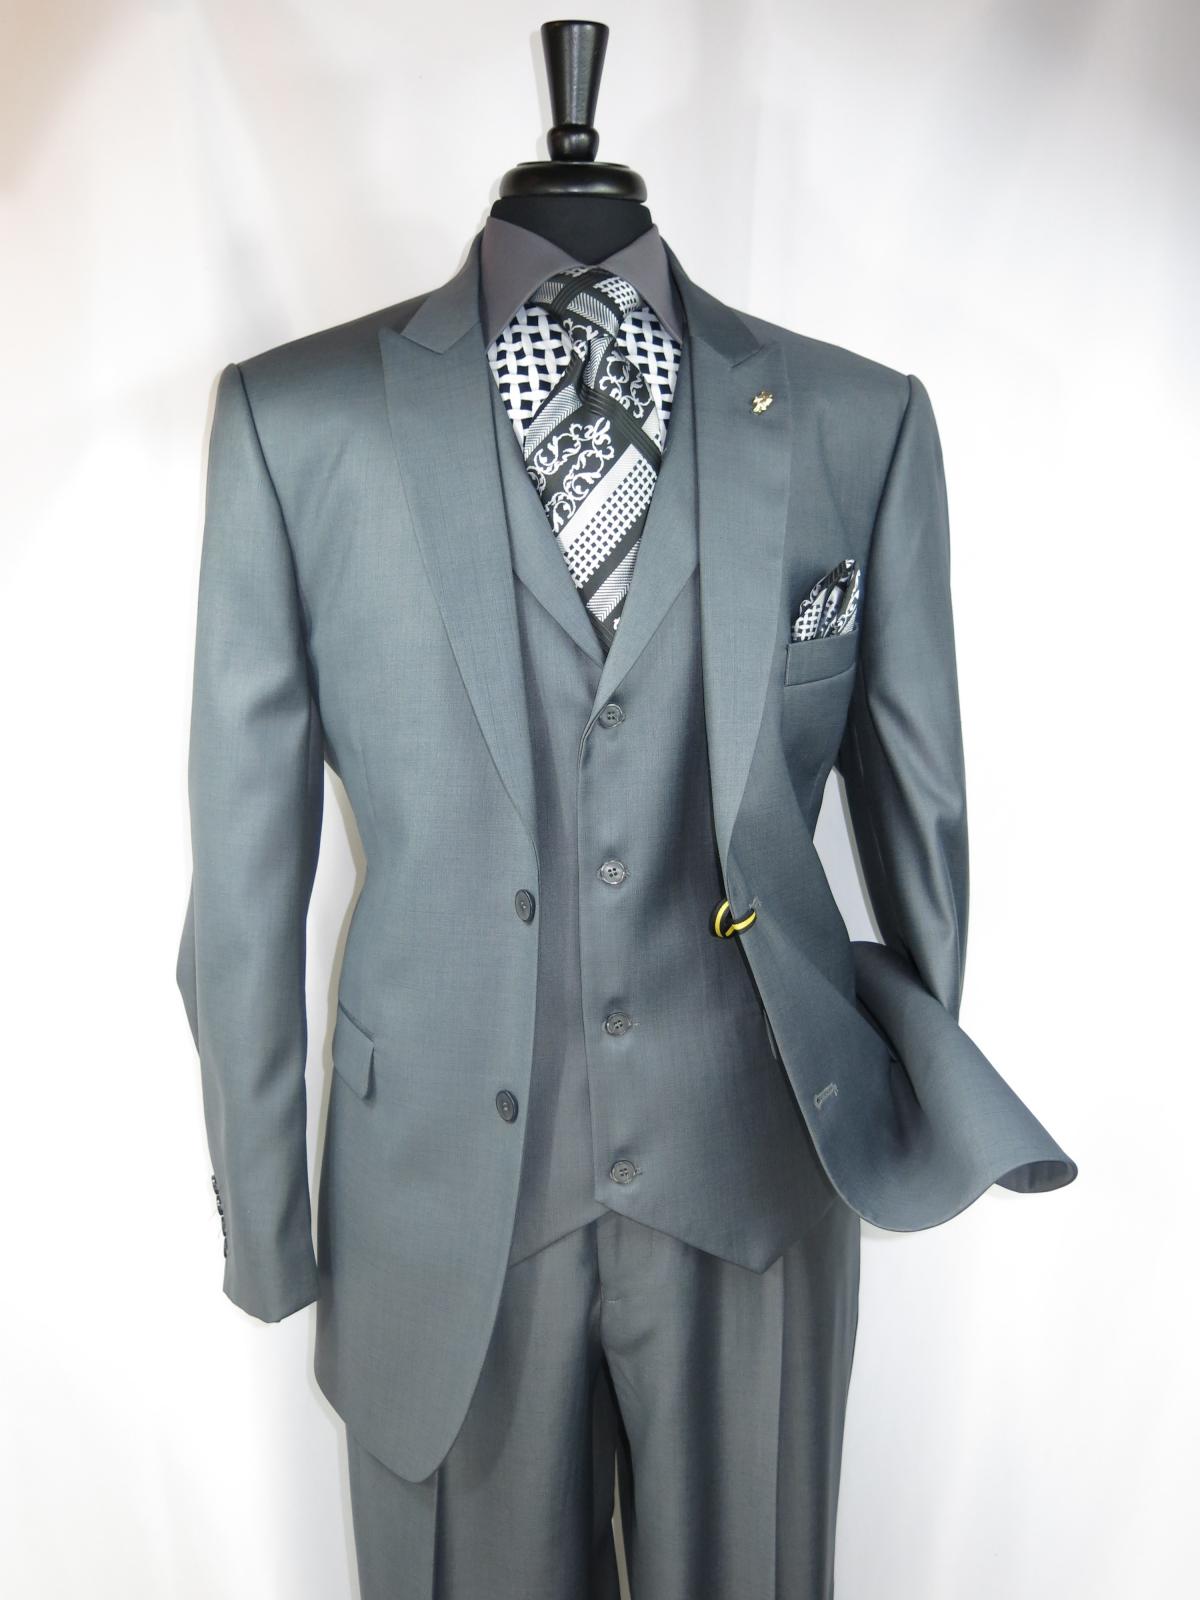 Outstanding Wedding Suit Hire Wigan Pattern - Wedding Plan Ideas ...